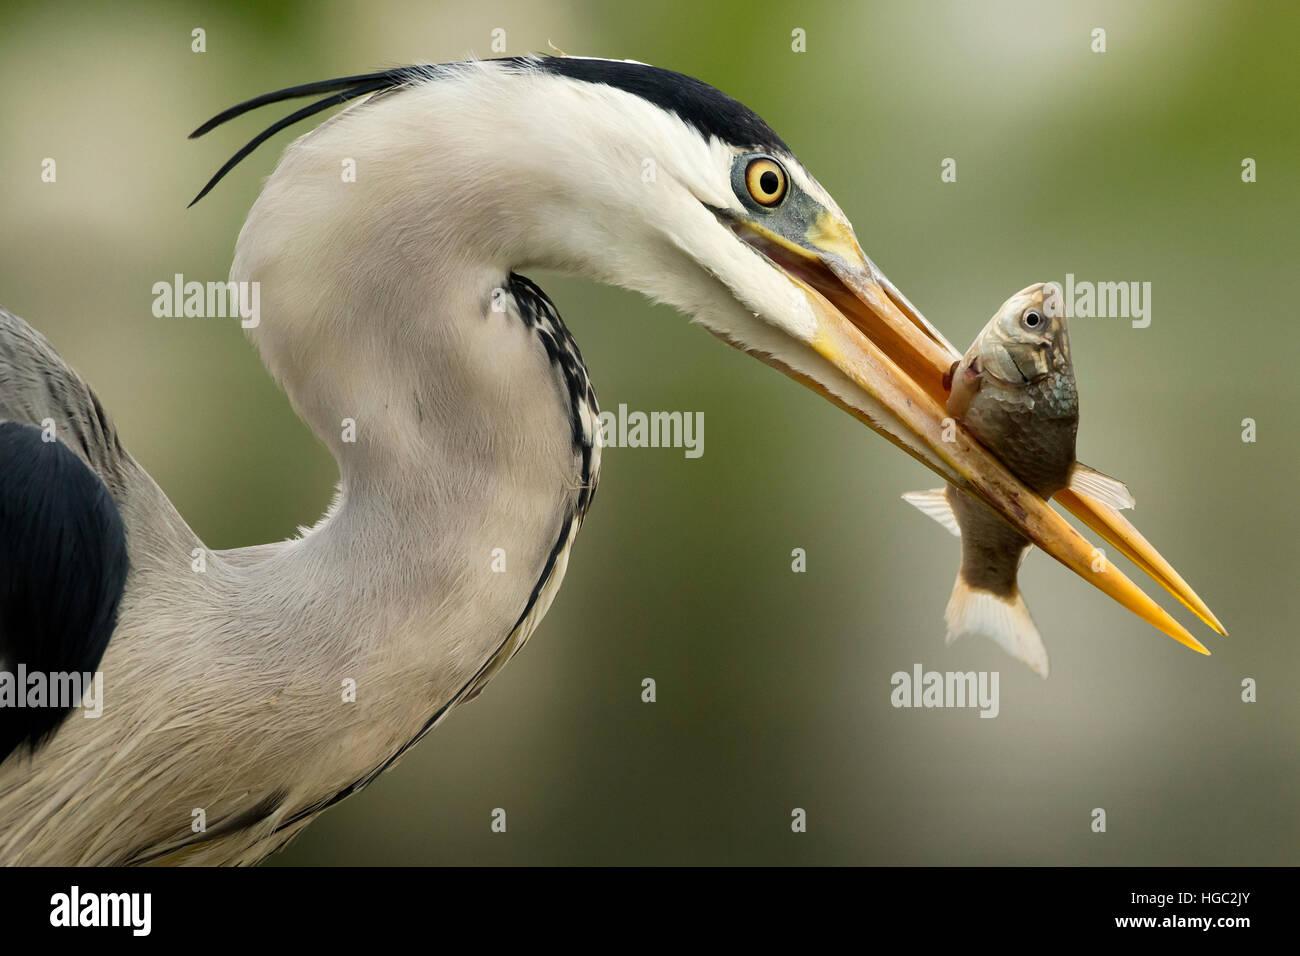 Garza real (Ardea cinerea) Coger un pez Imagen De Stock